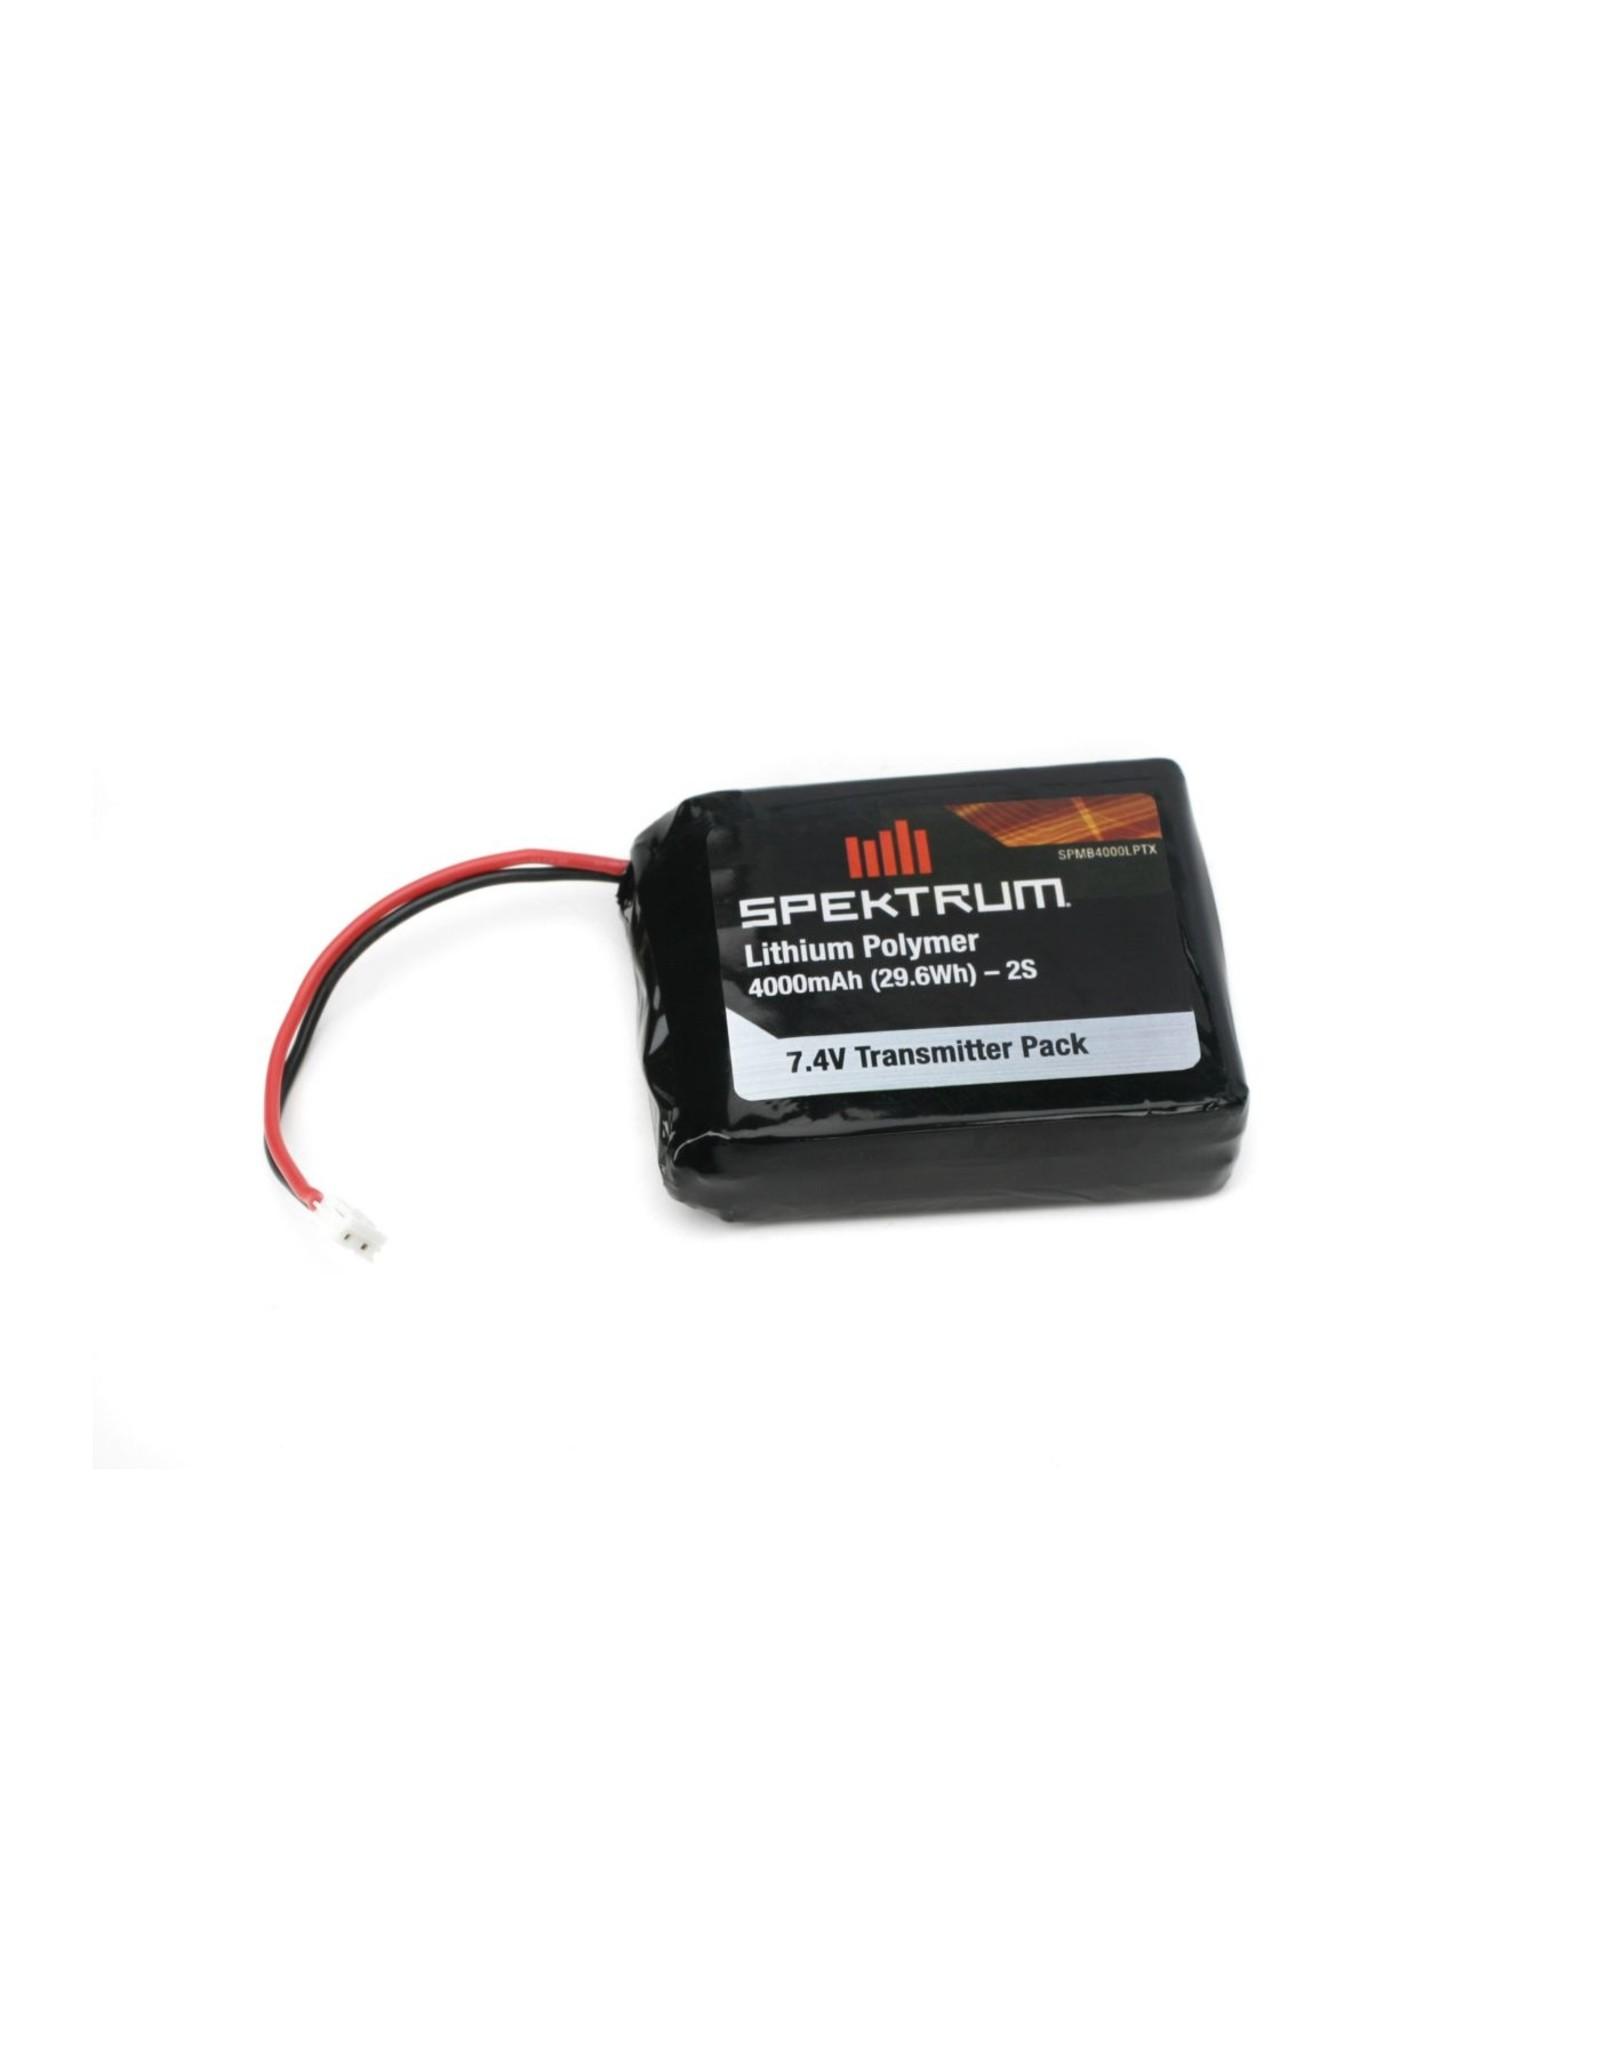 Spektrum 4000mAh LiPo Transmitter Battery: DX8, DX9